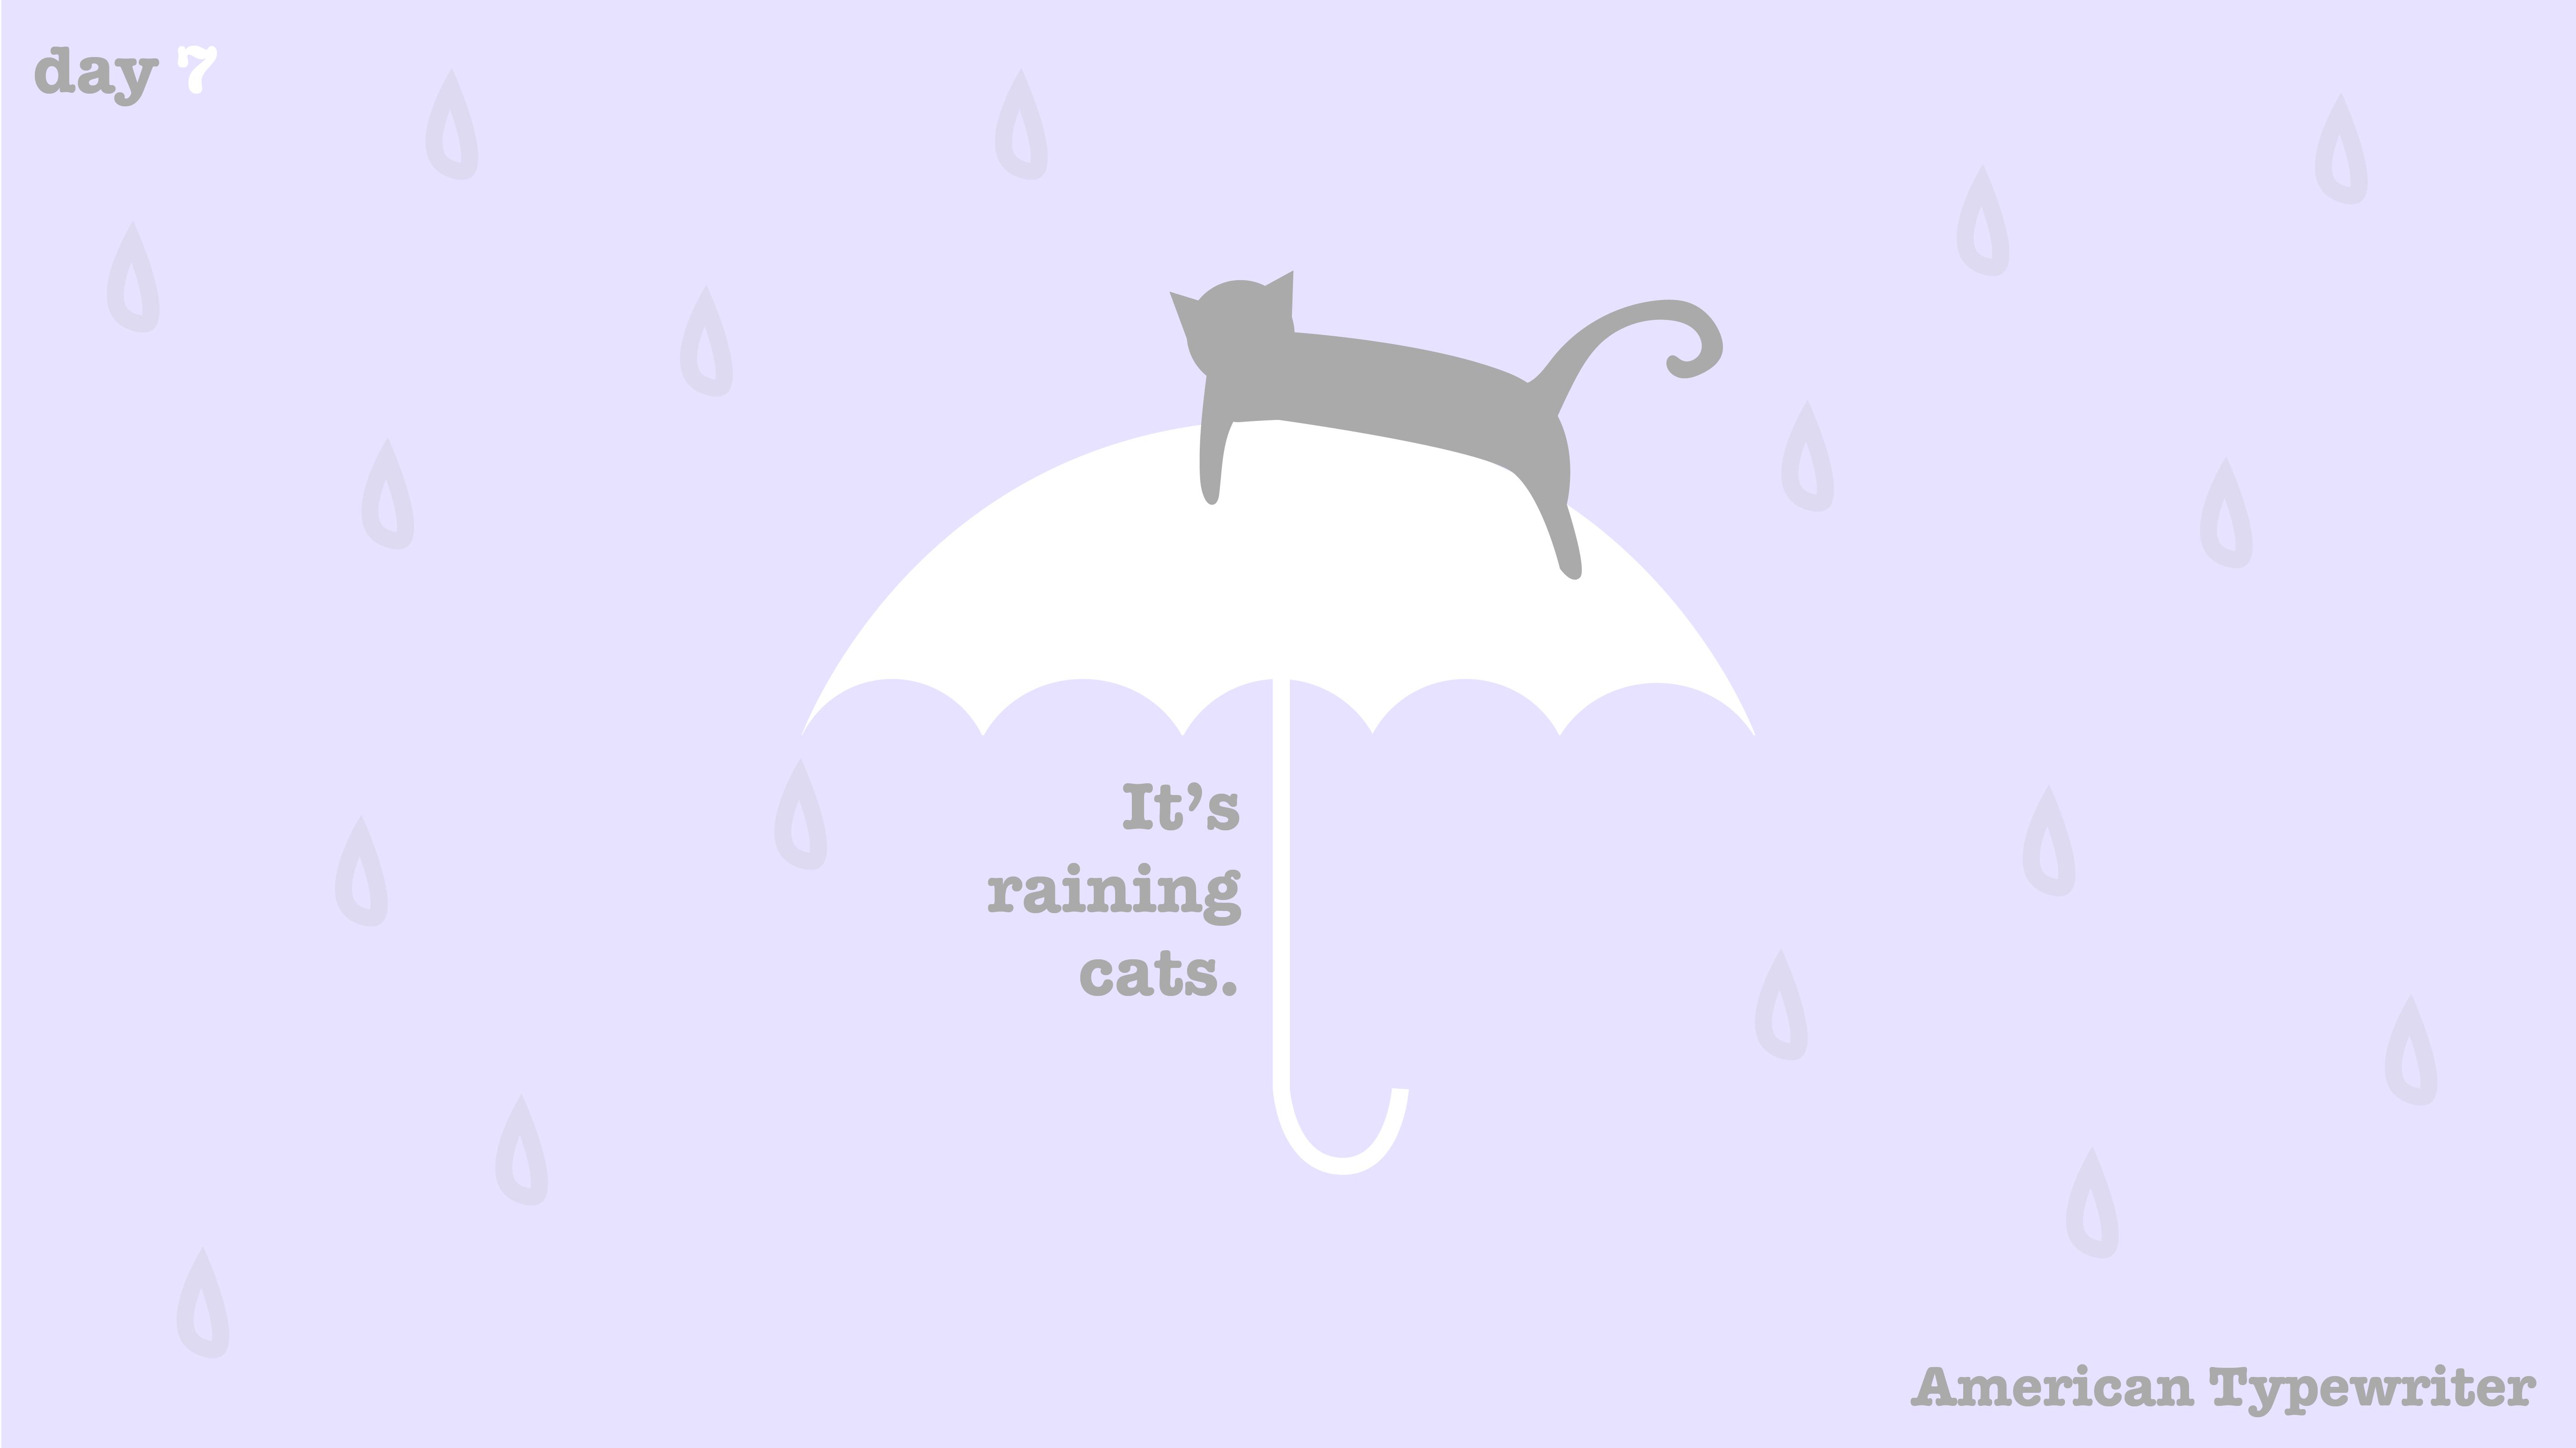 [cat]day1-07